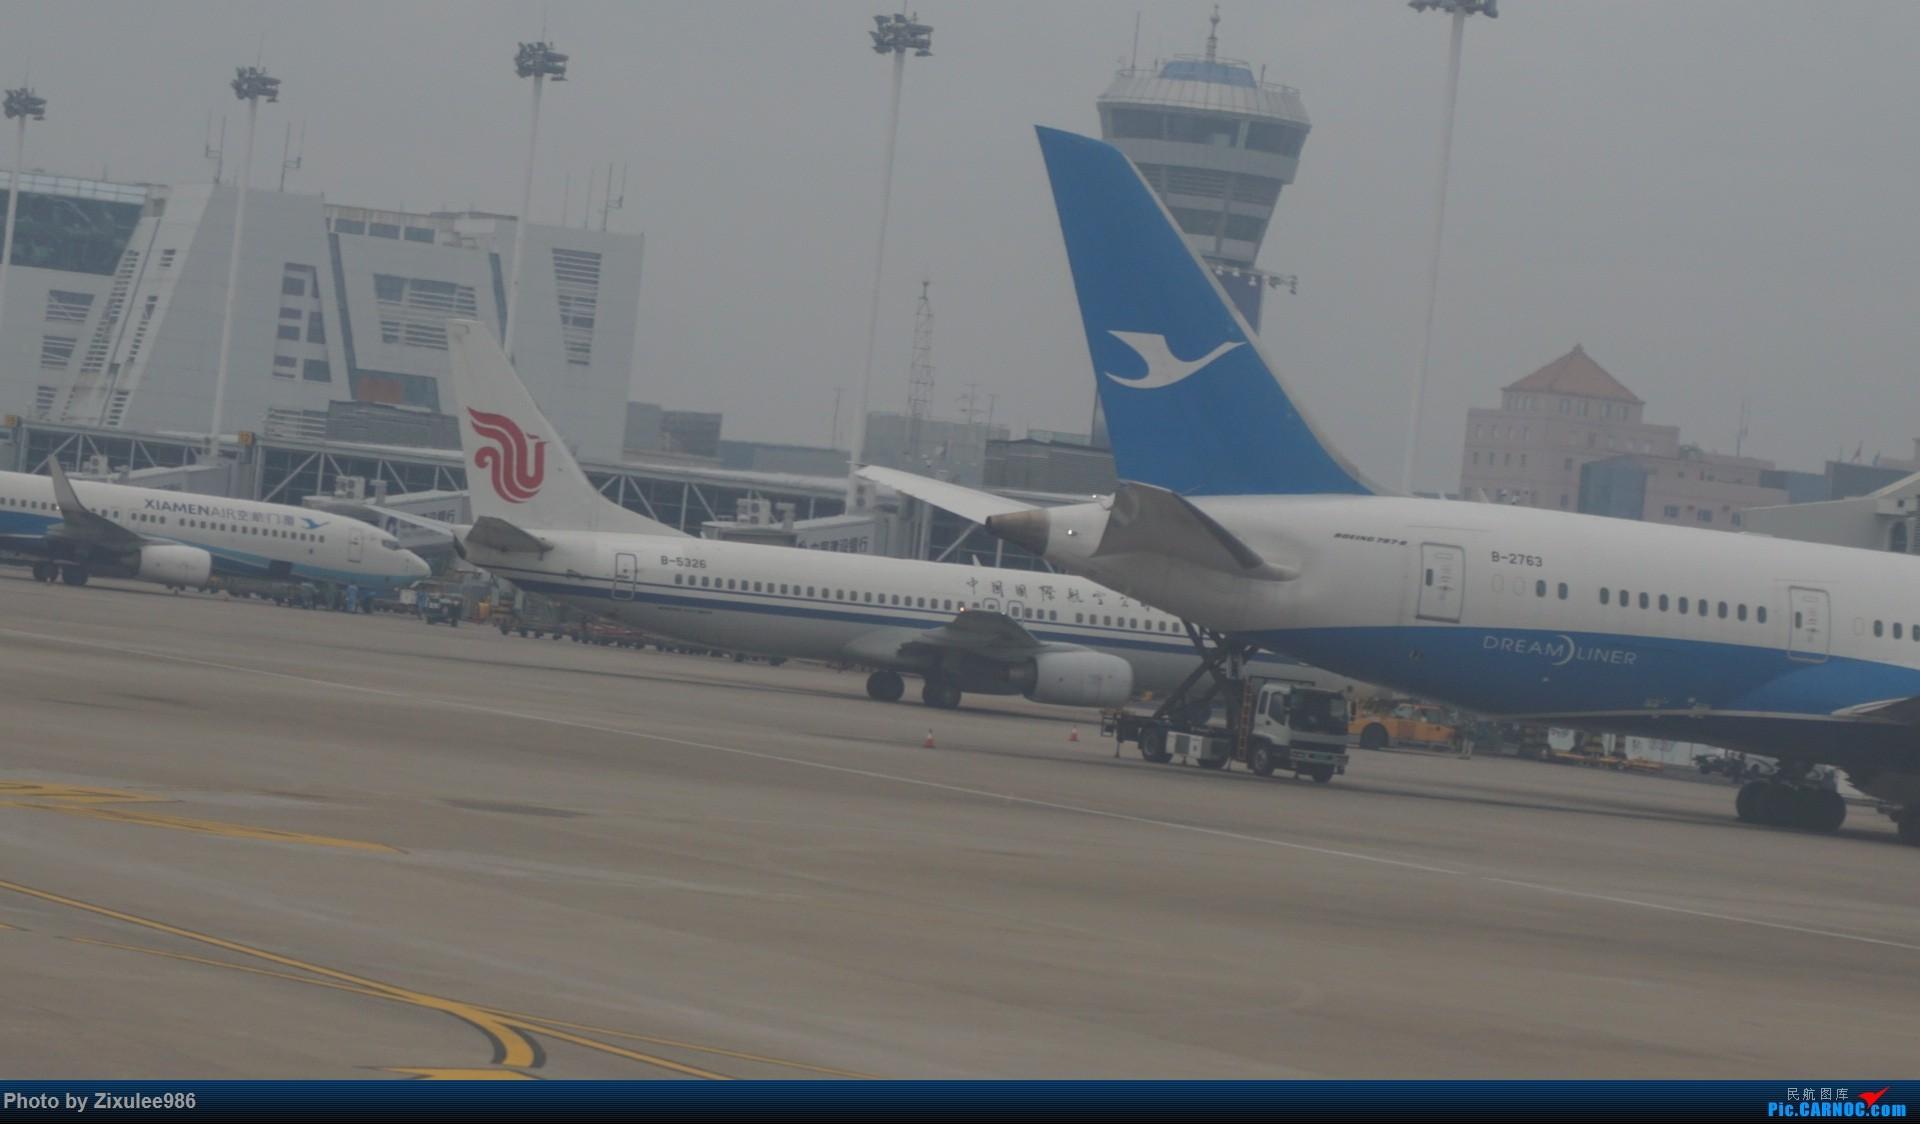 Re:[原创][XMN]寒假东北游随拍PART1--厦航篇~头一次拍752 BOEING 737-800 B-5326 中国厦门高崎国际机场